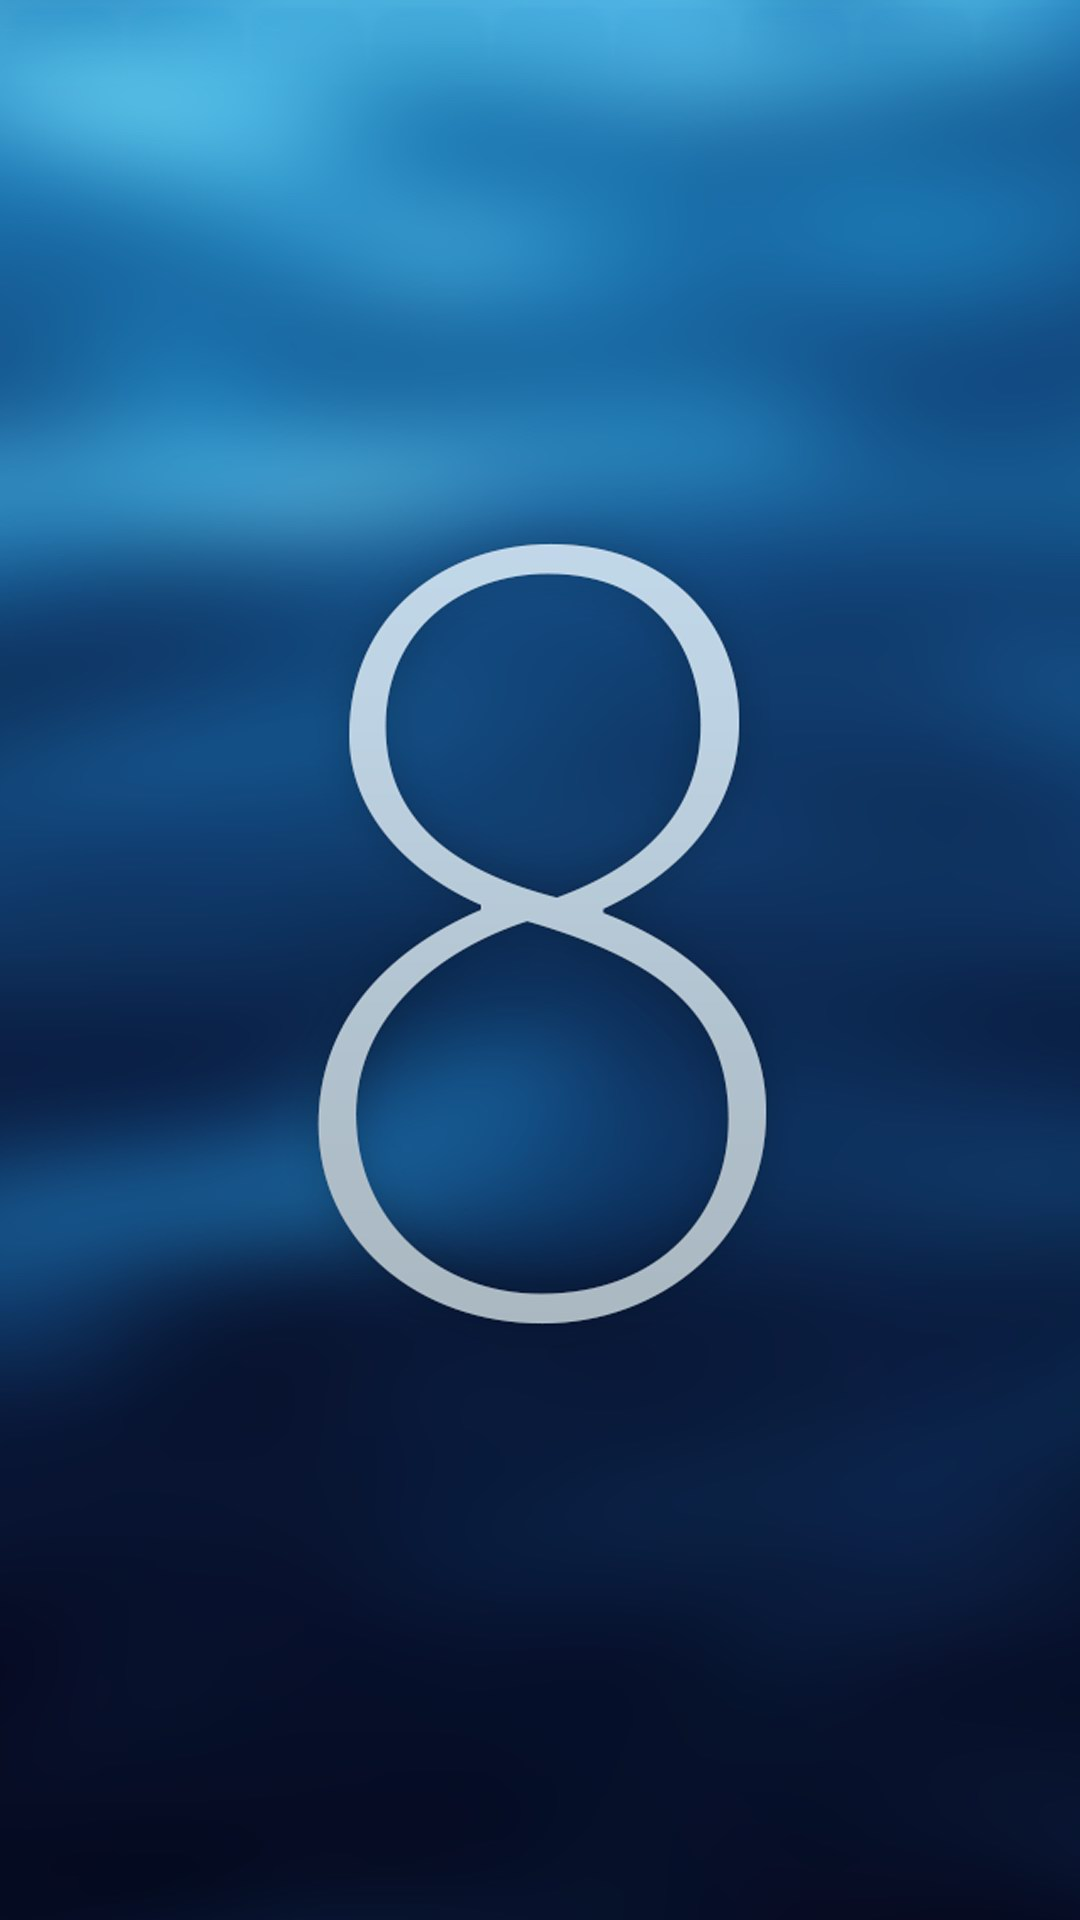 iOS-8-Stock-Wallpaper-2